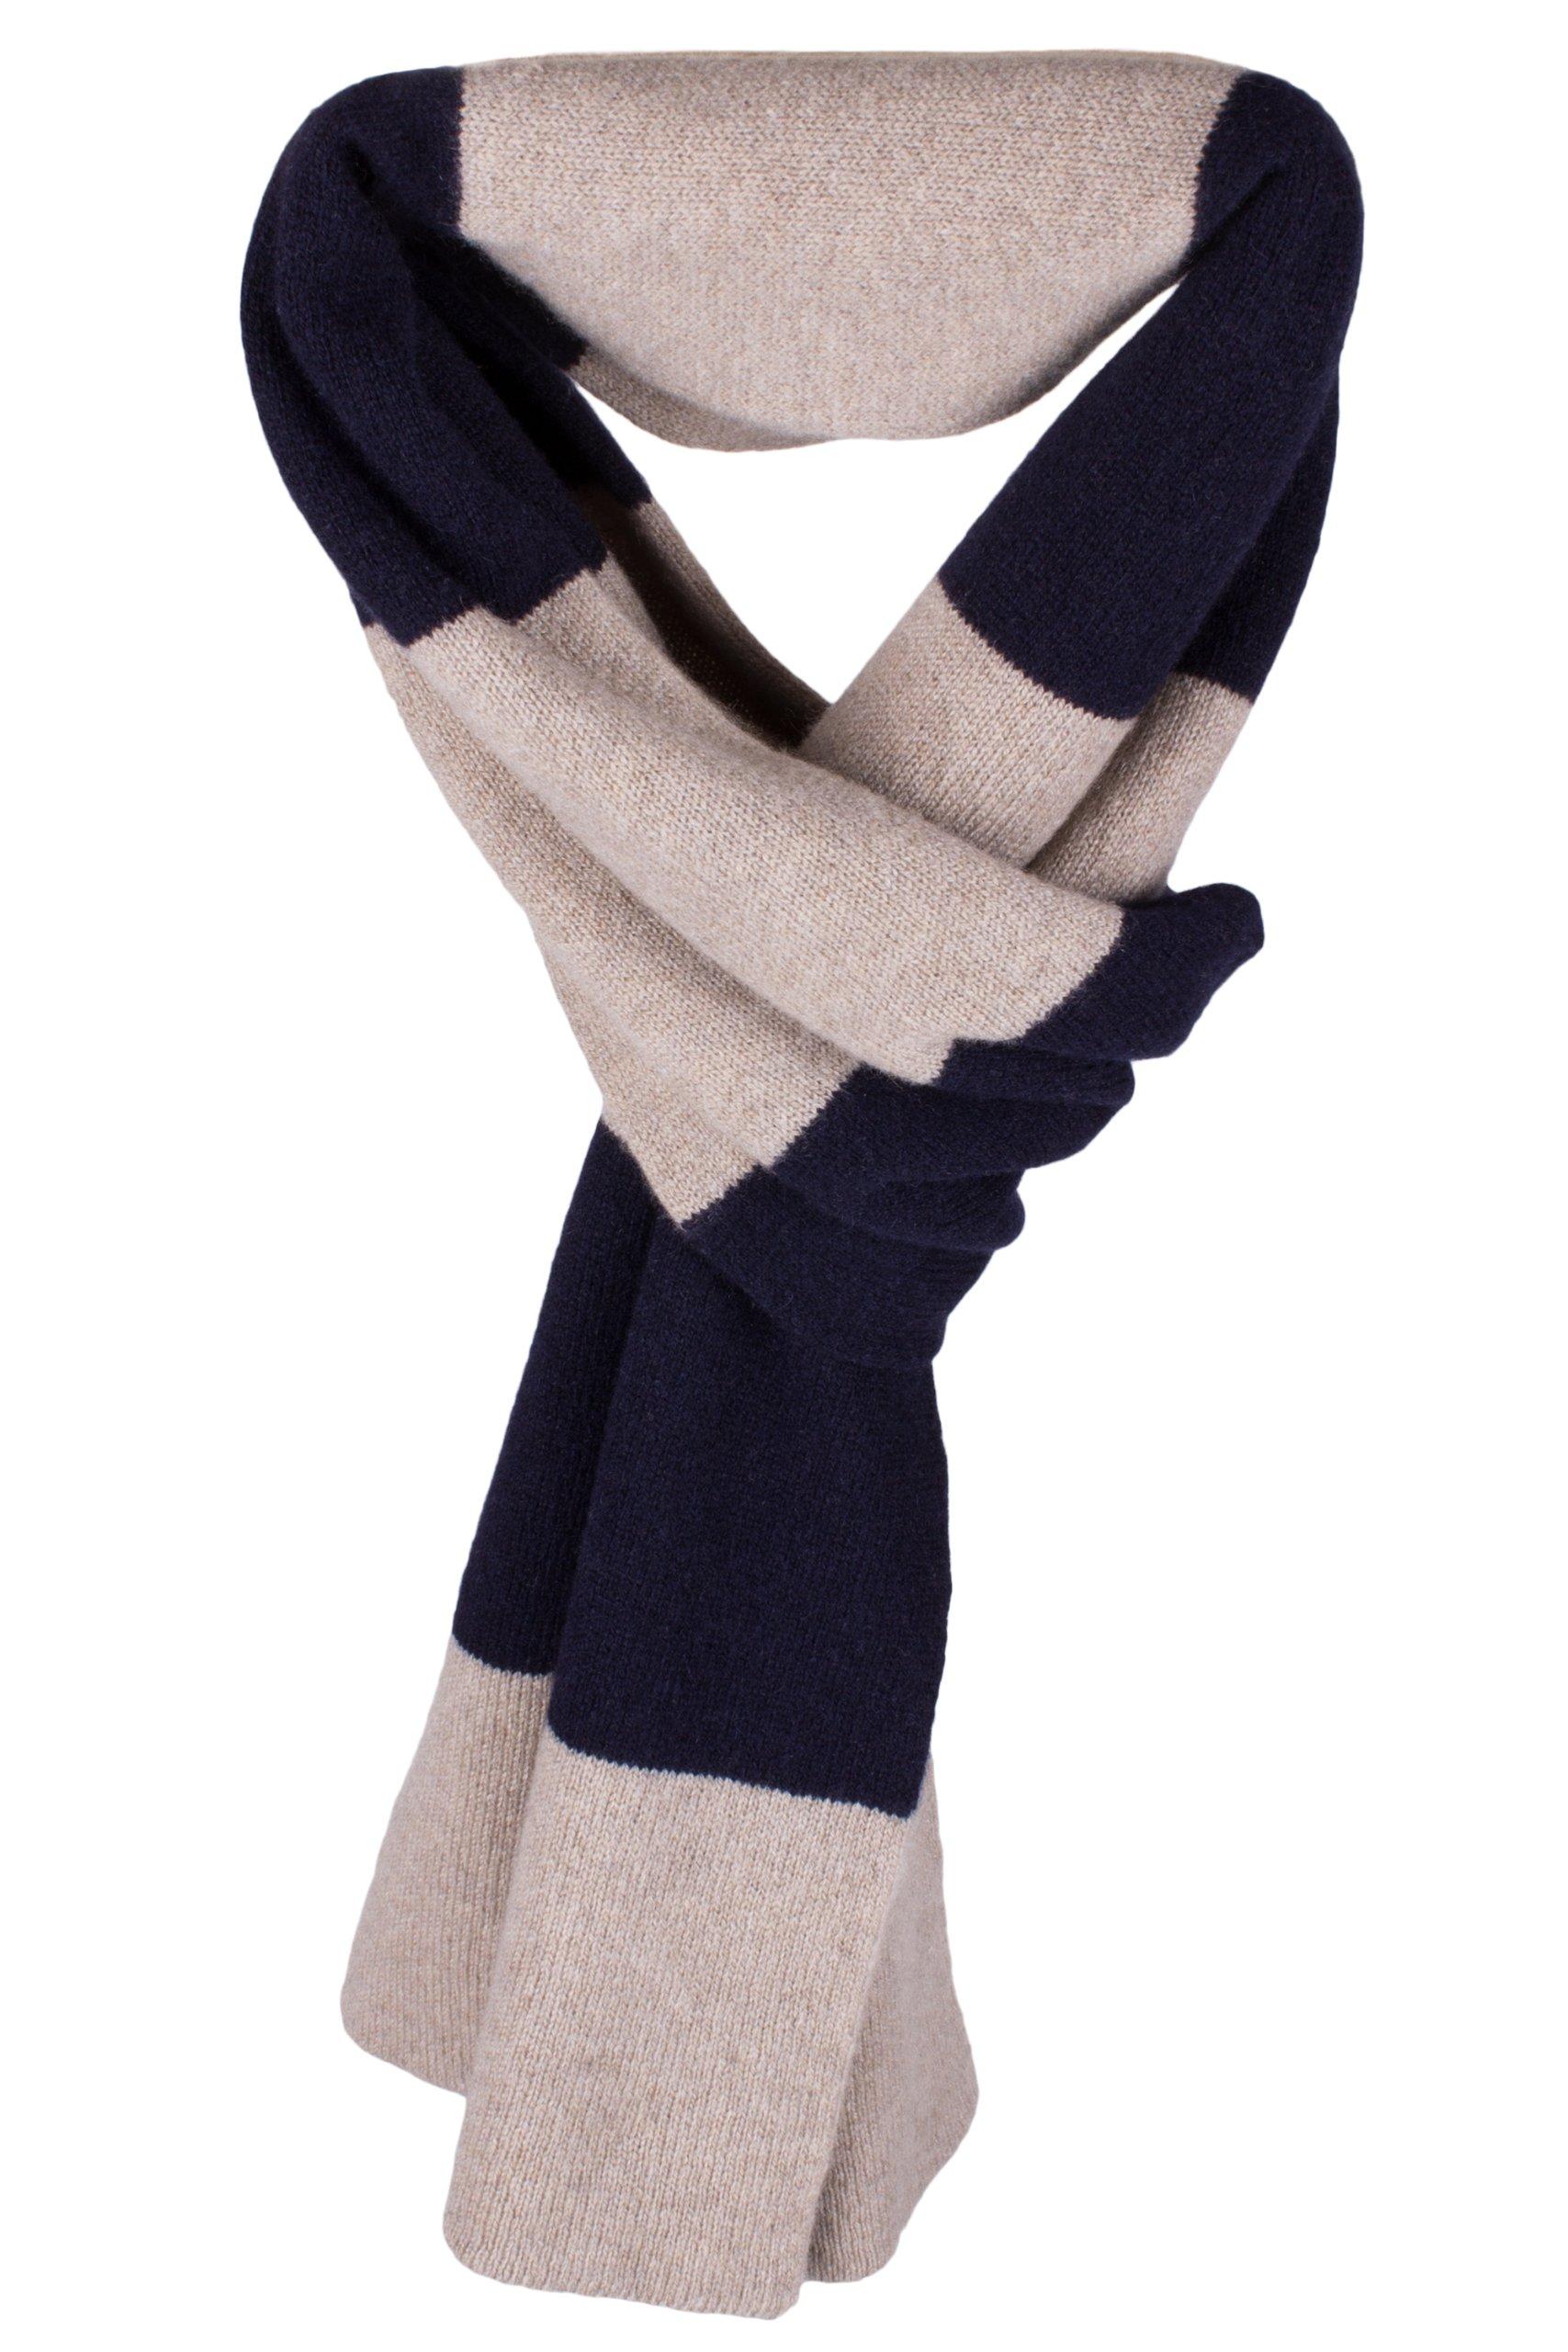 Ladies Striped 100% Cashmere Scarf - Natural / Dark Navy - hand made in Scotland by Love Cashmere